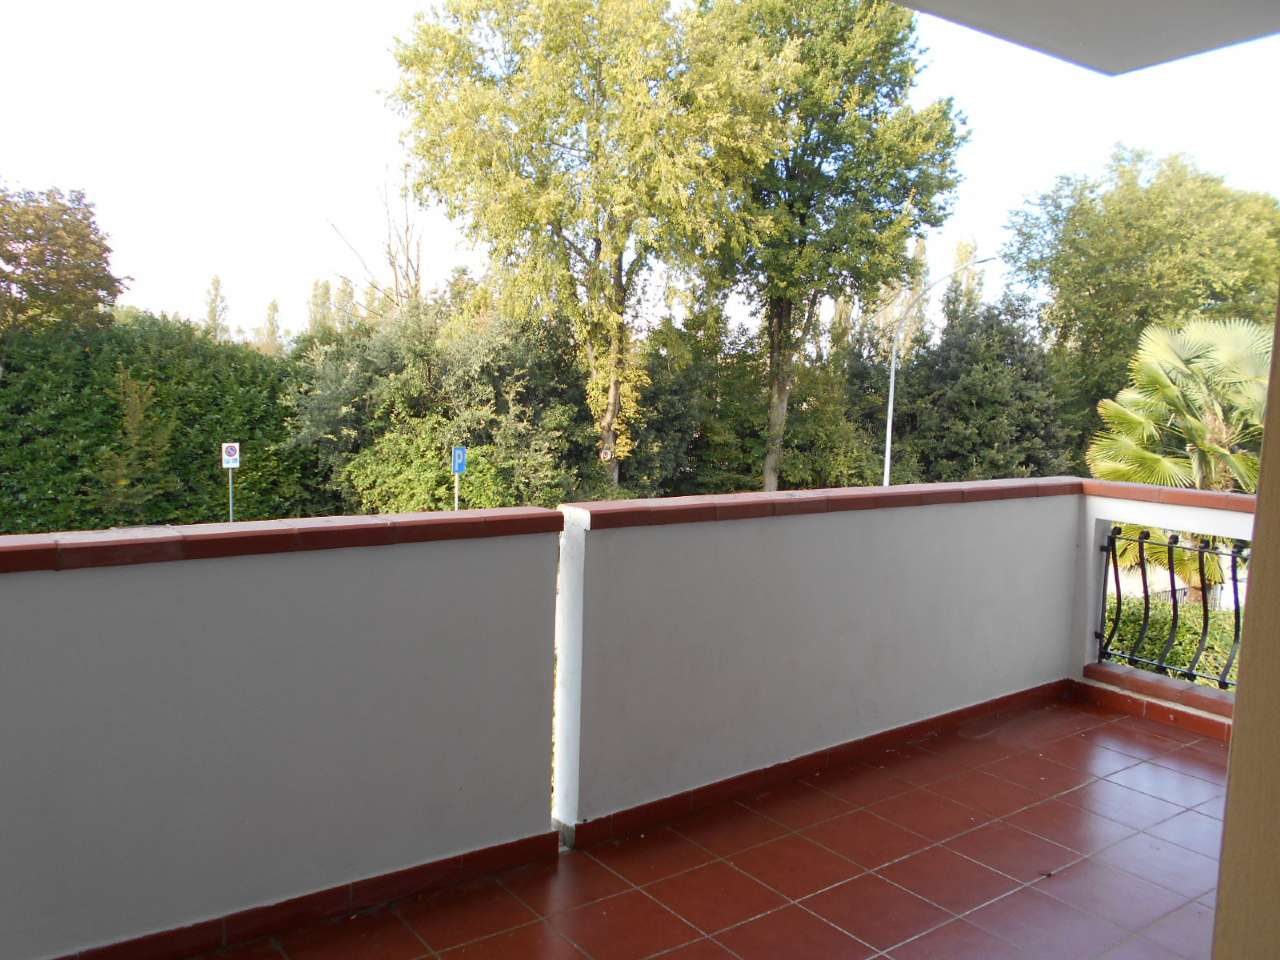 Villetta, Via Umago, Caorle, foto 14